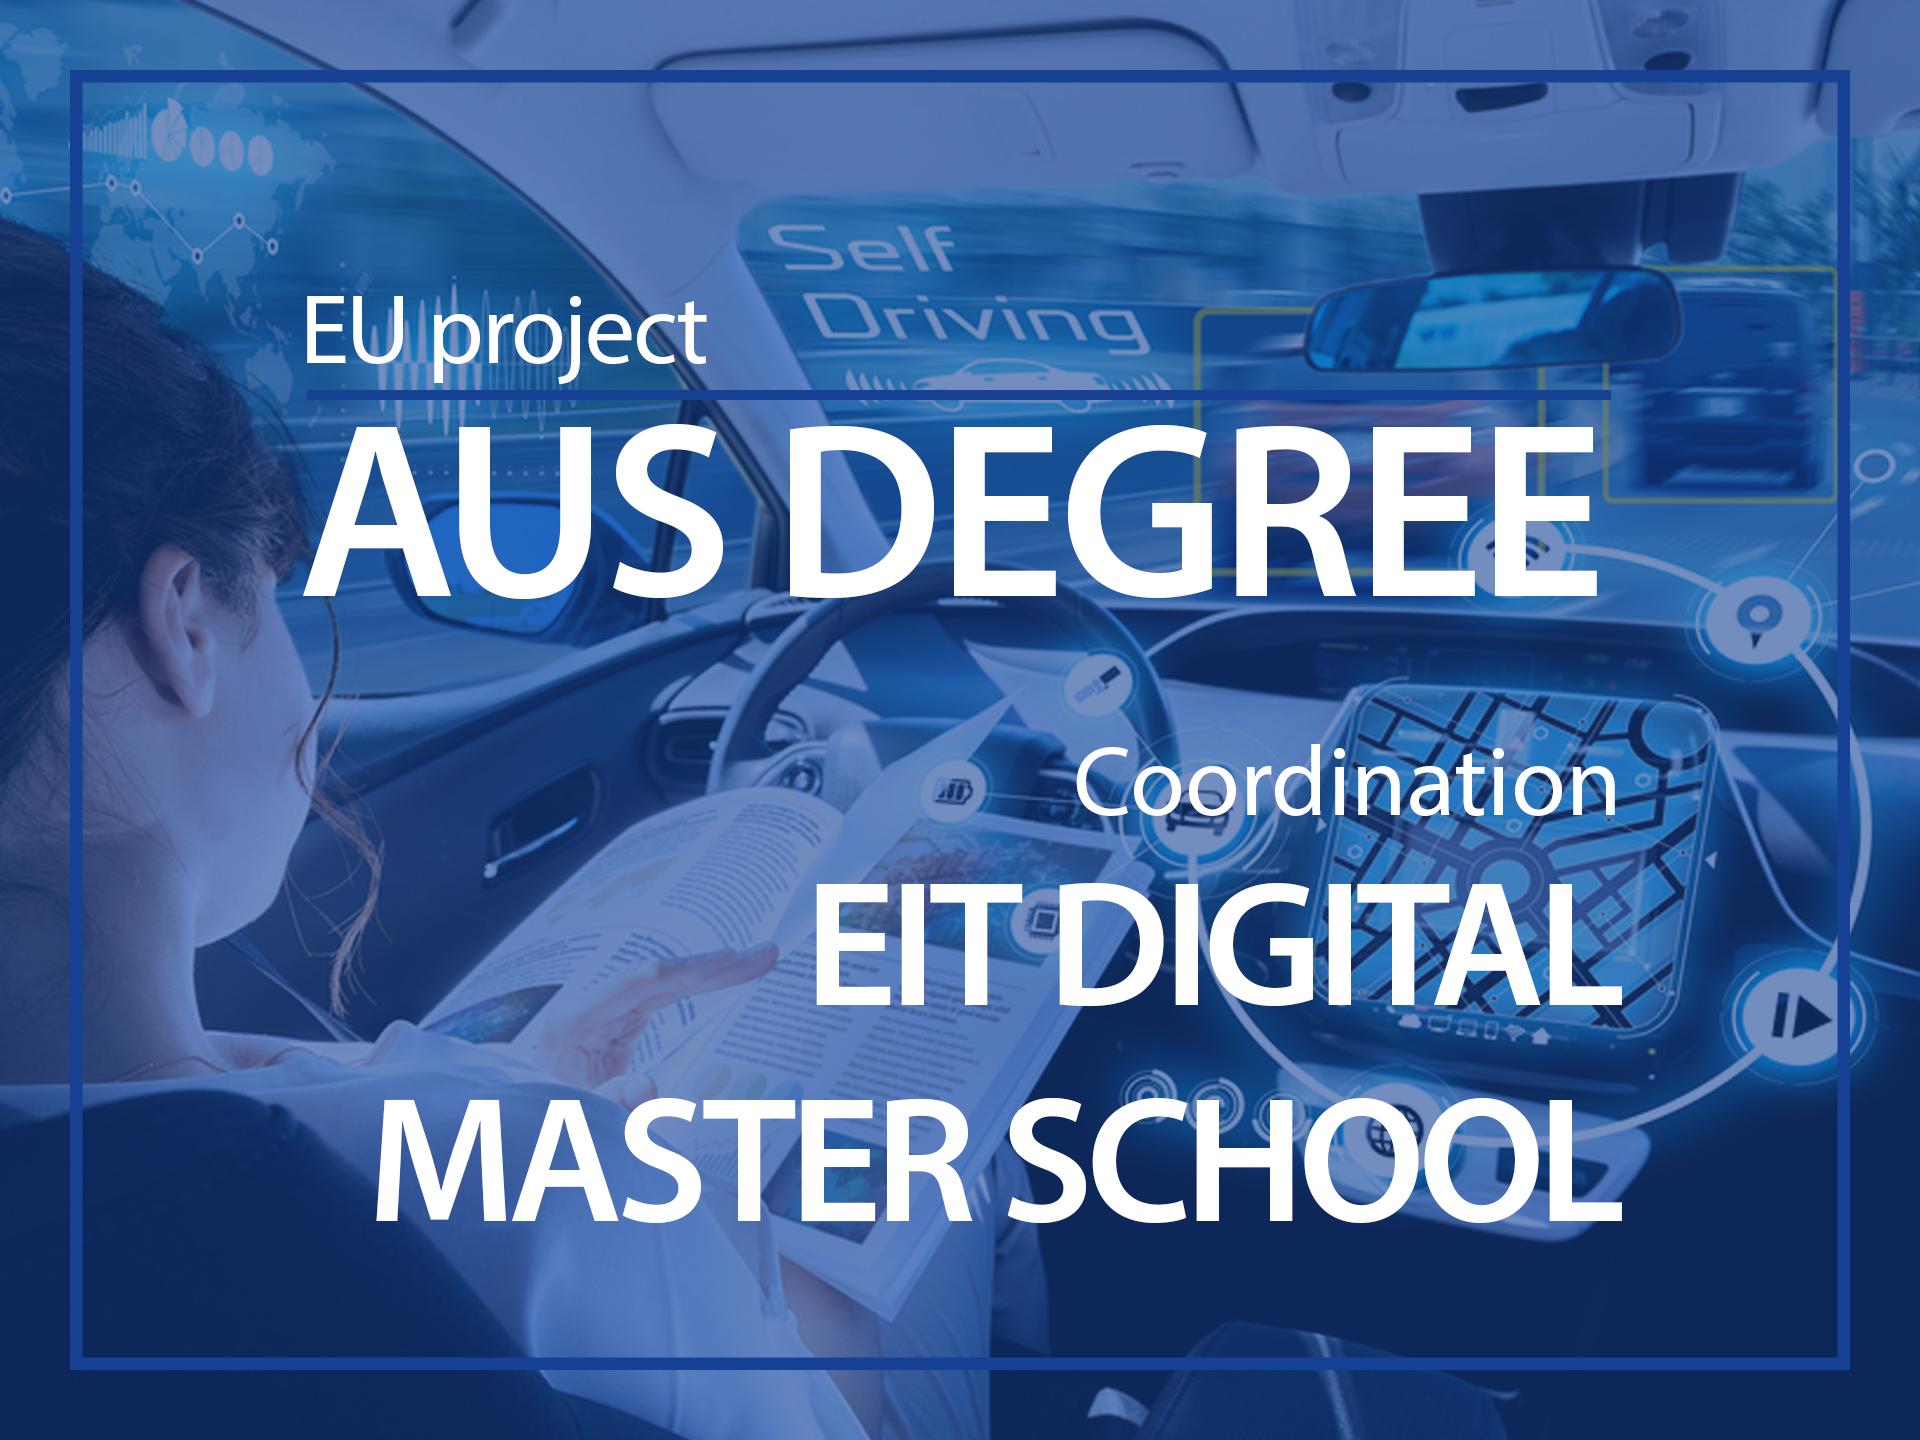 EU Project : AUS degree